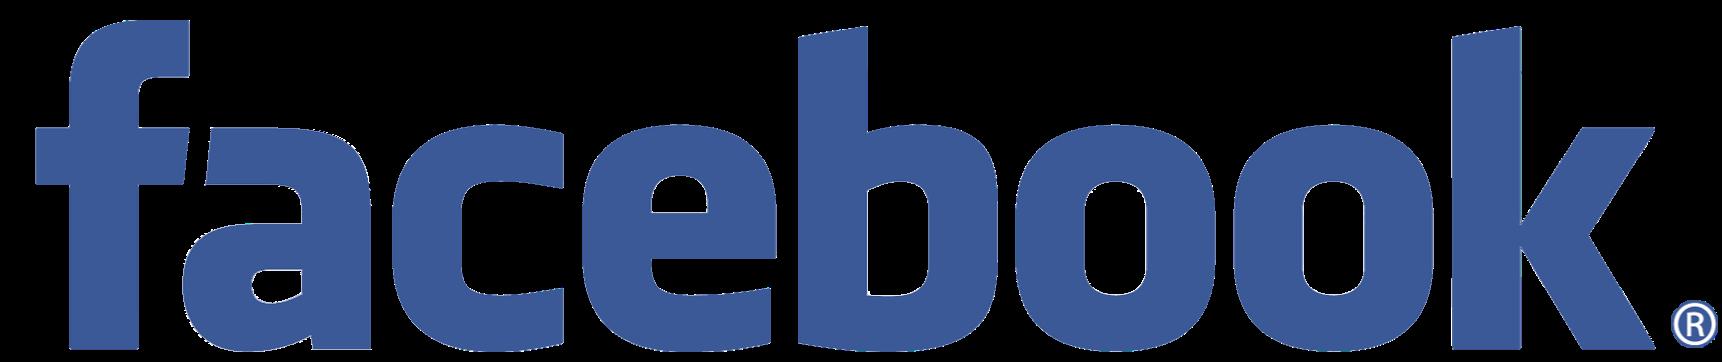 sosyal-medya-yonetimi-manas-medya-produksyon-reklam-ajansi Sosyal Medya Yönetimi facebook